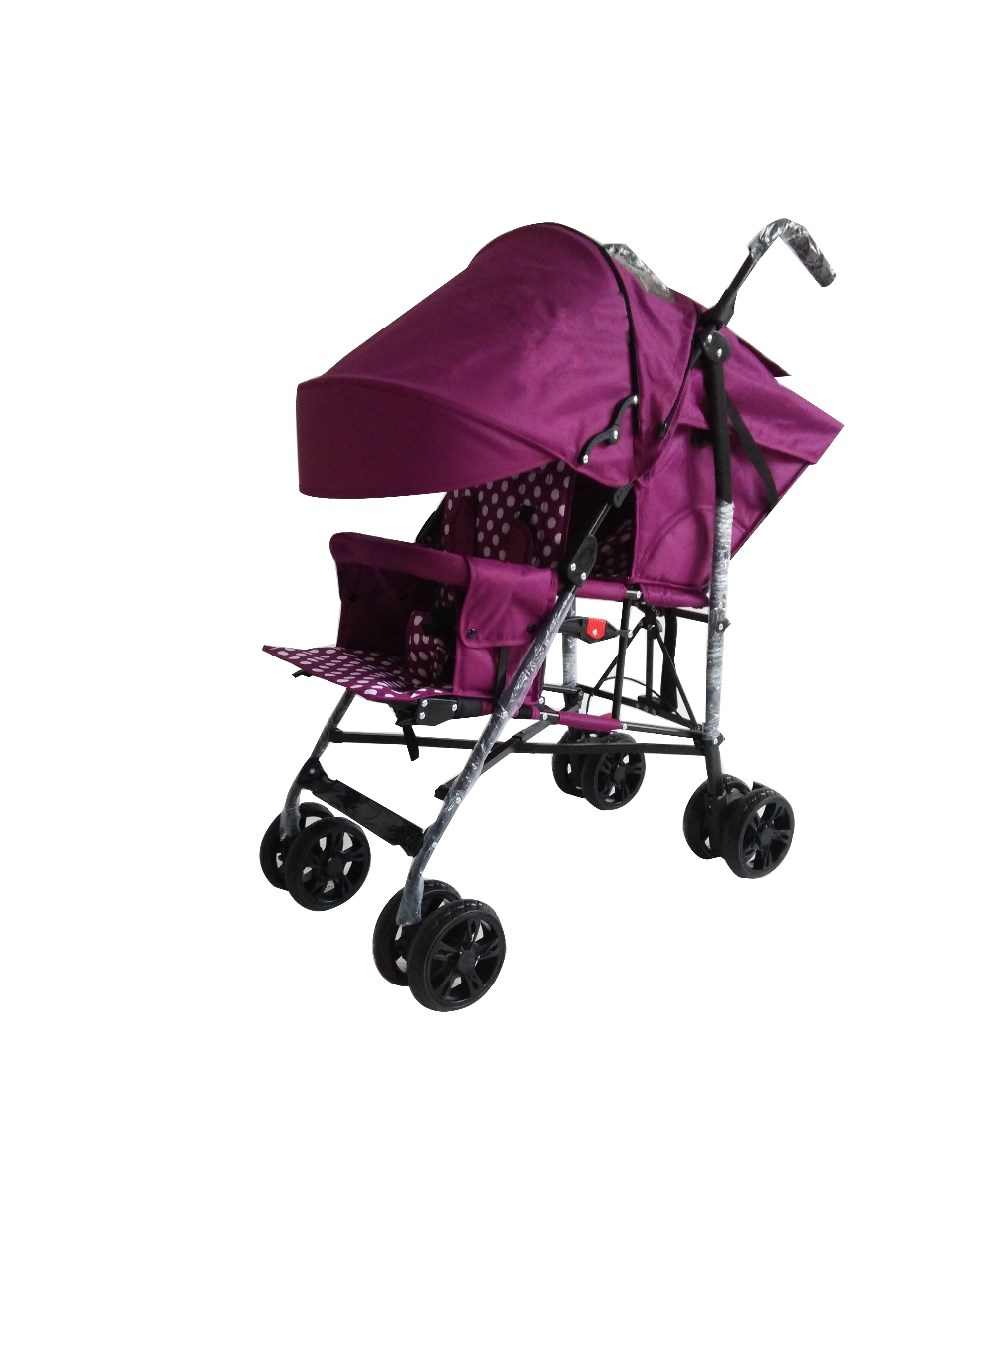 Pram For Twins Cheap Baby Stroller Buy Rolls Royce Baby